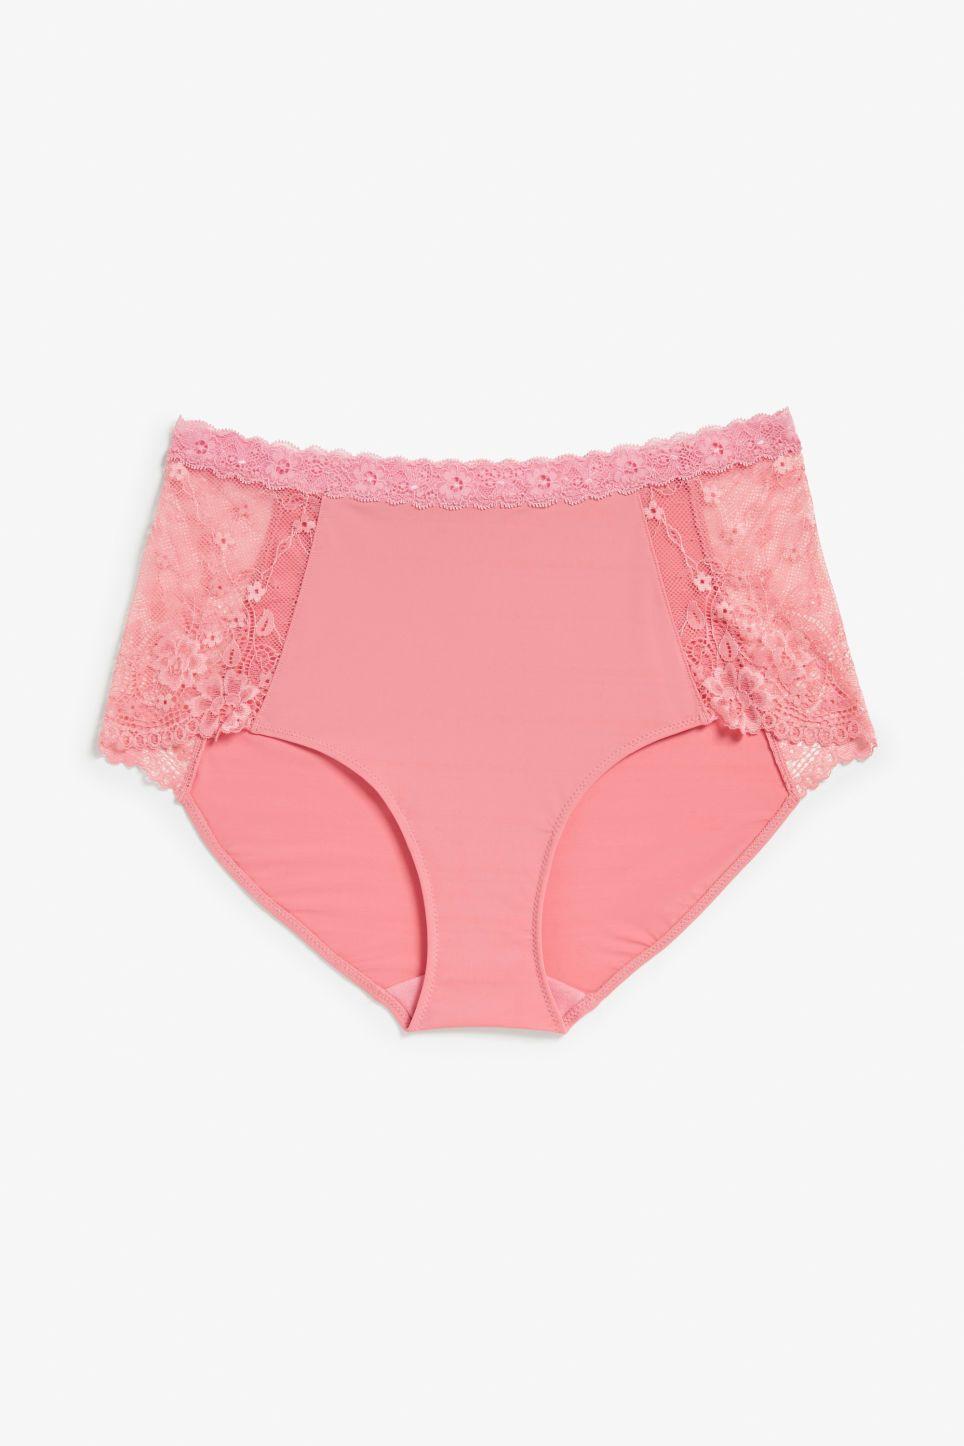 8f9edbd13b Lace panel high waist briefs - Blush bae blush pink - Underwear - Monki FR